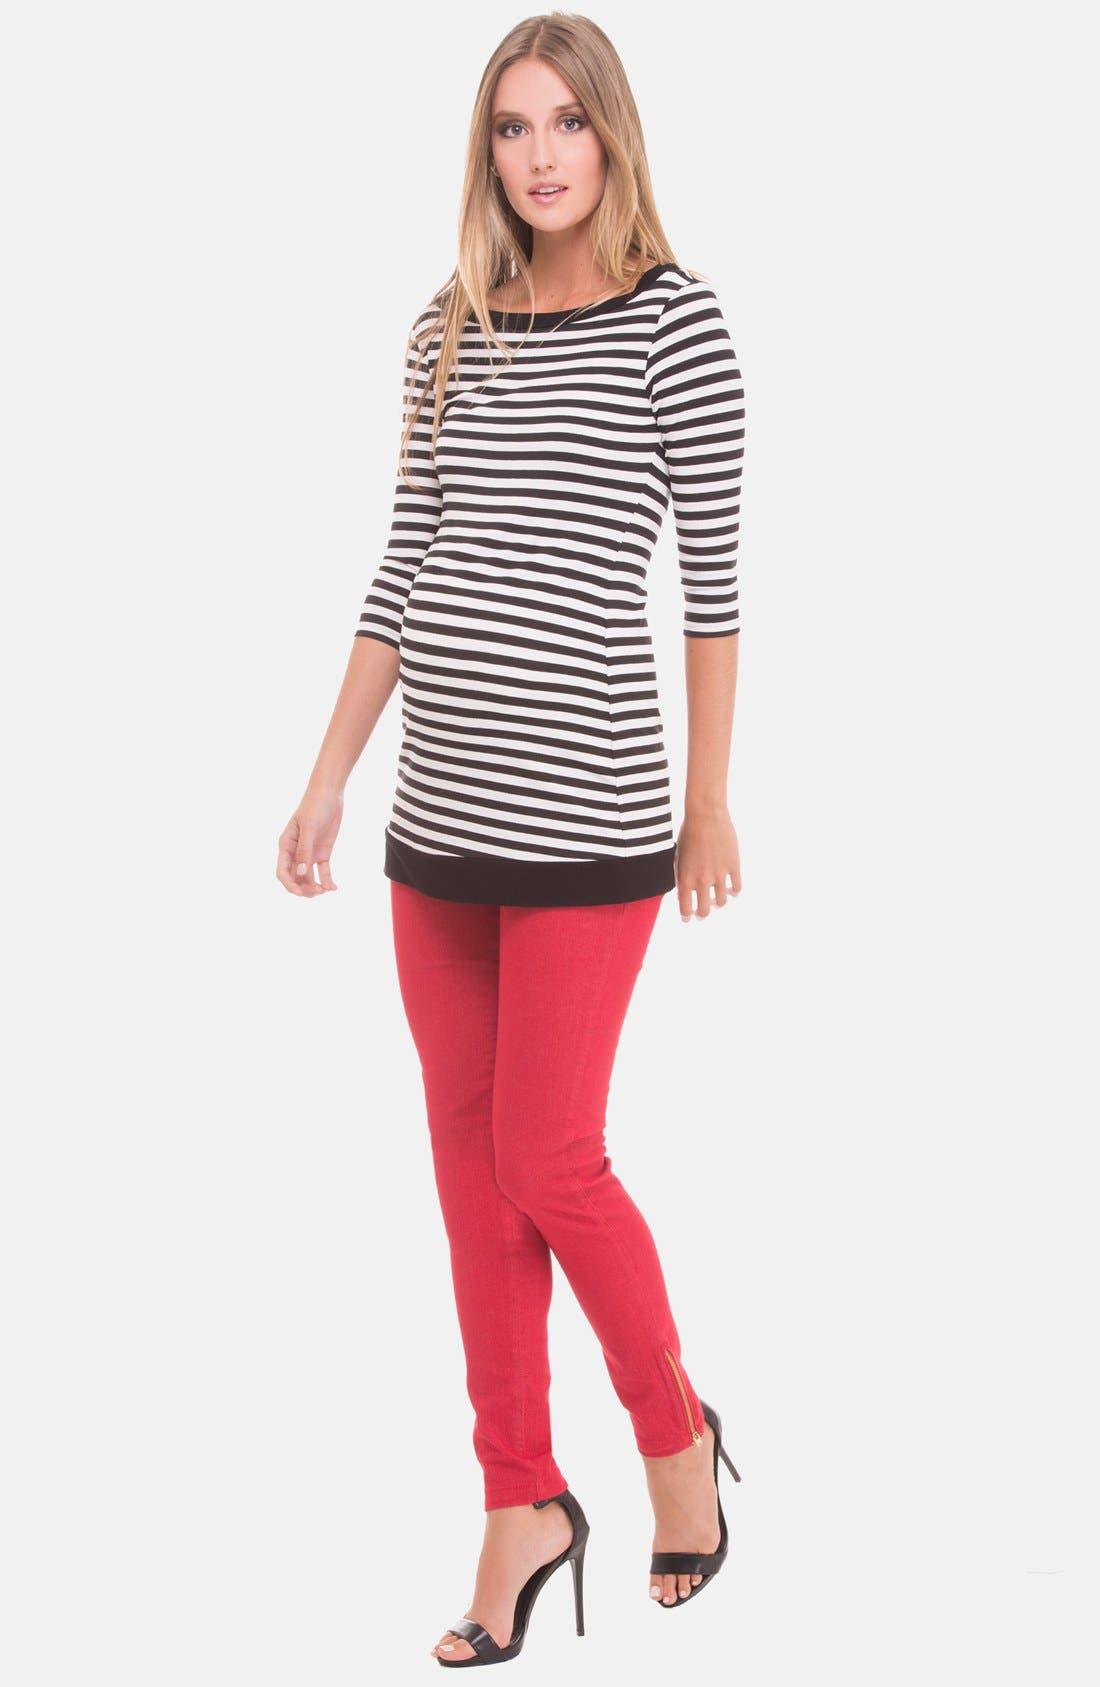 Alternate Image 1 Selected - Olian Stripe Boatneck Maternity Top